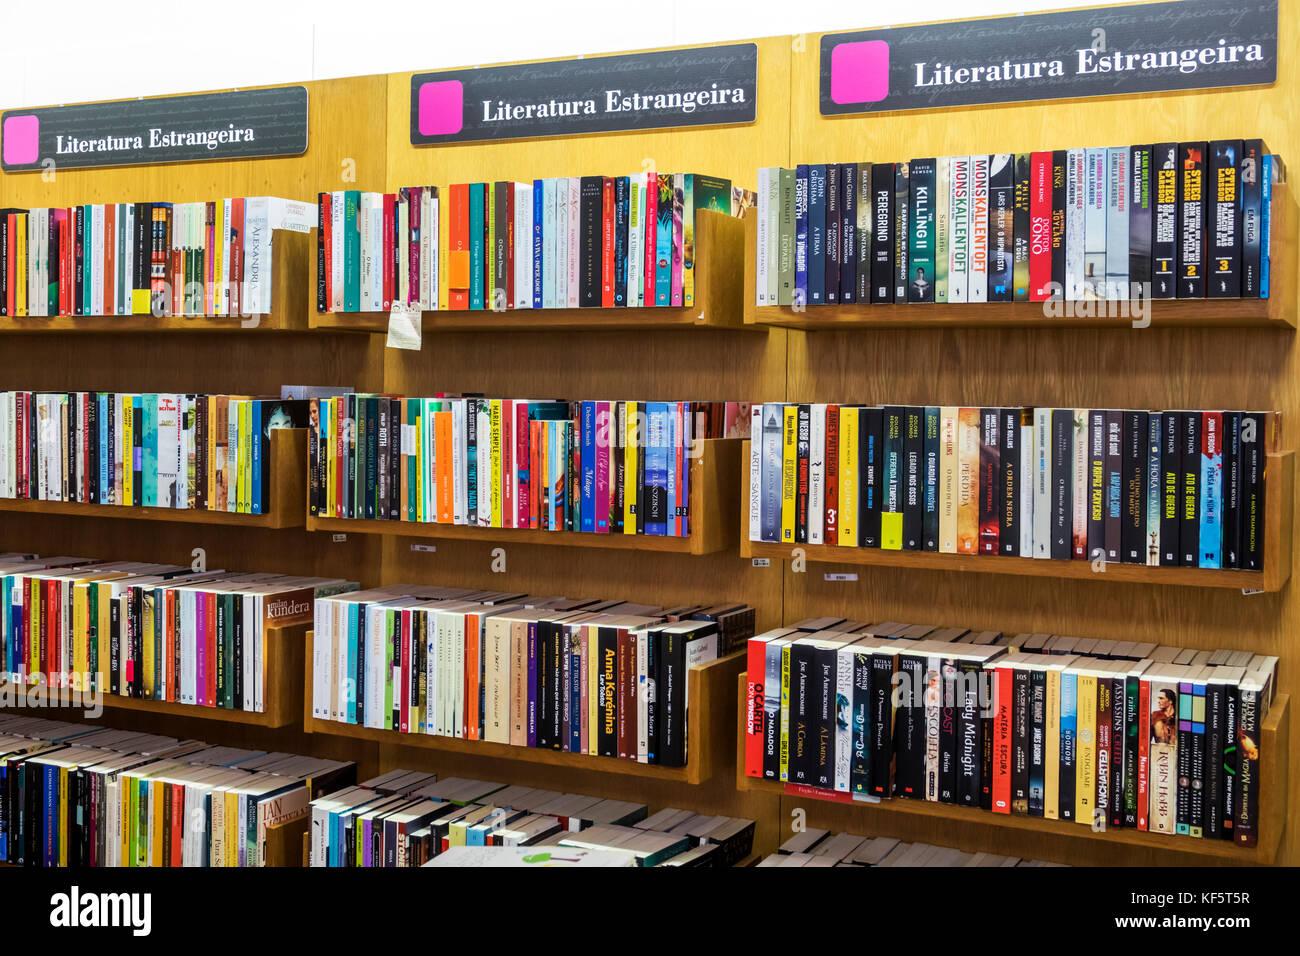 Lisbon Portugal Belem Centro Cultural de Belem cultural center arts complex Bertrand bookstore bookshop books shelves - Stock Image